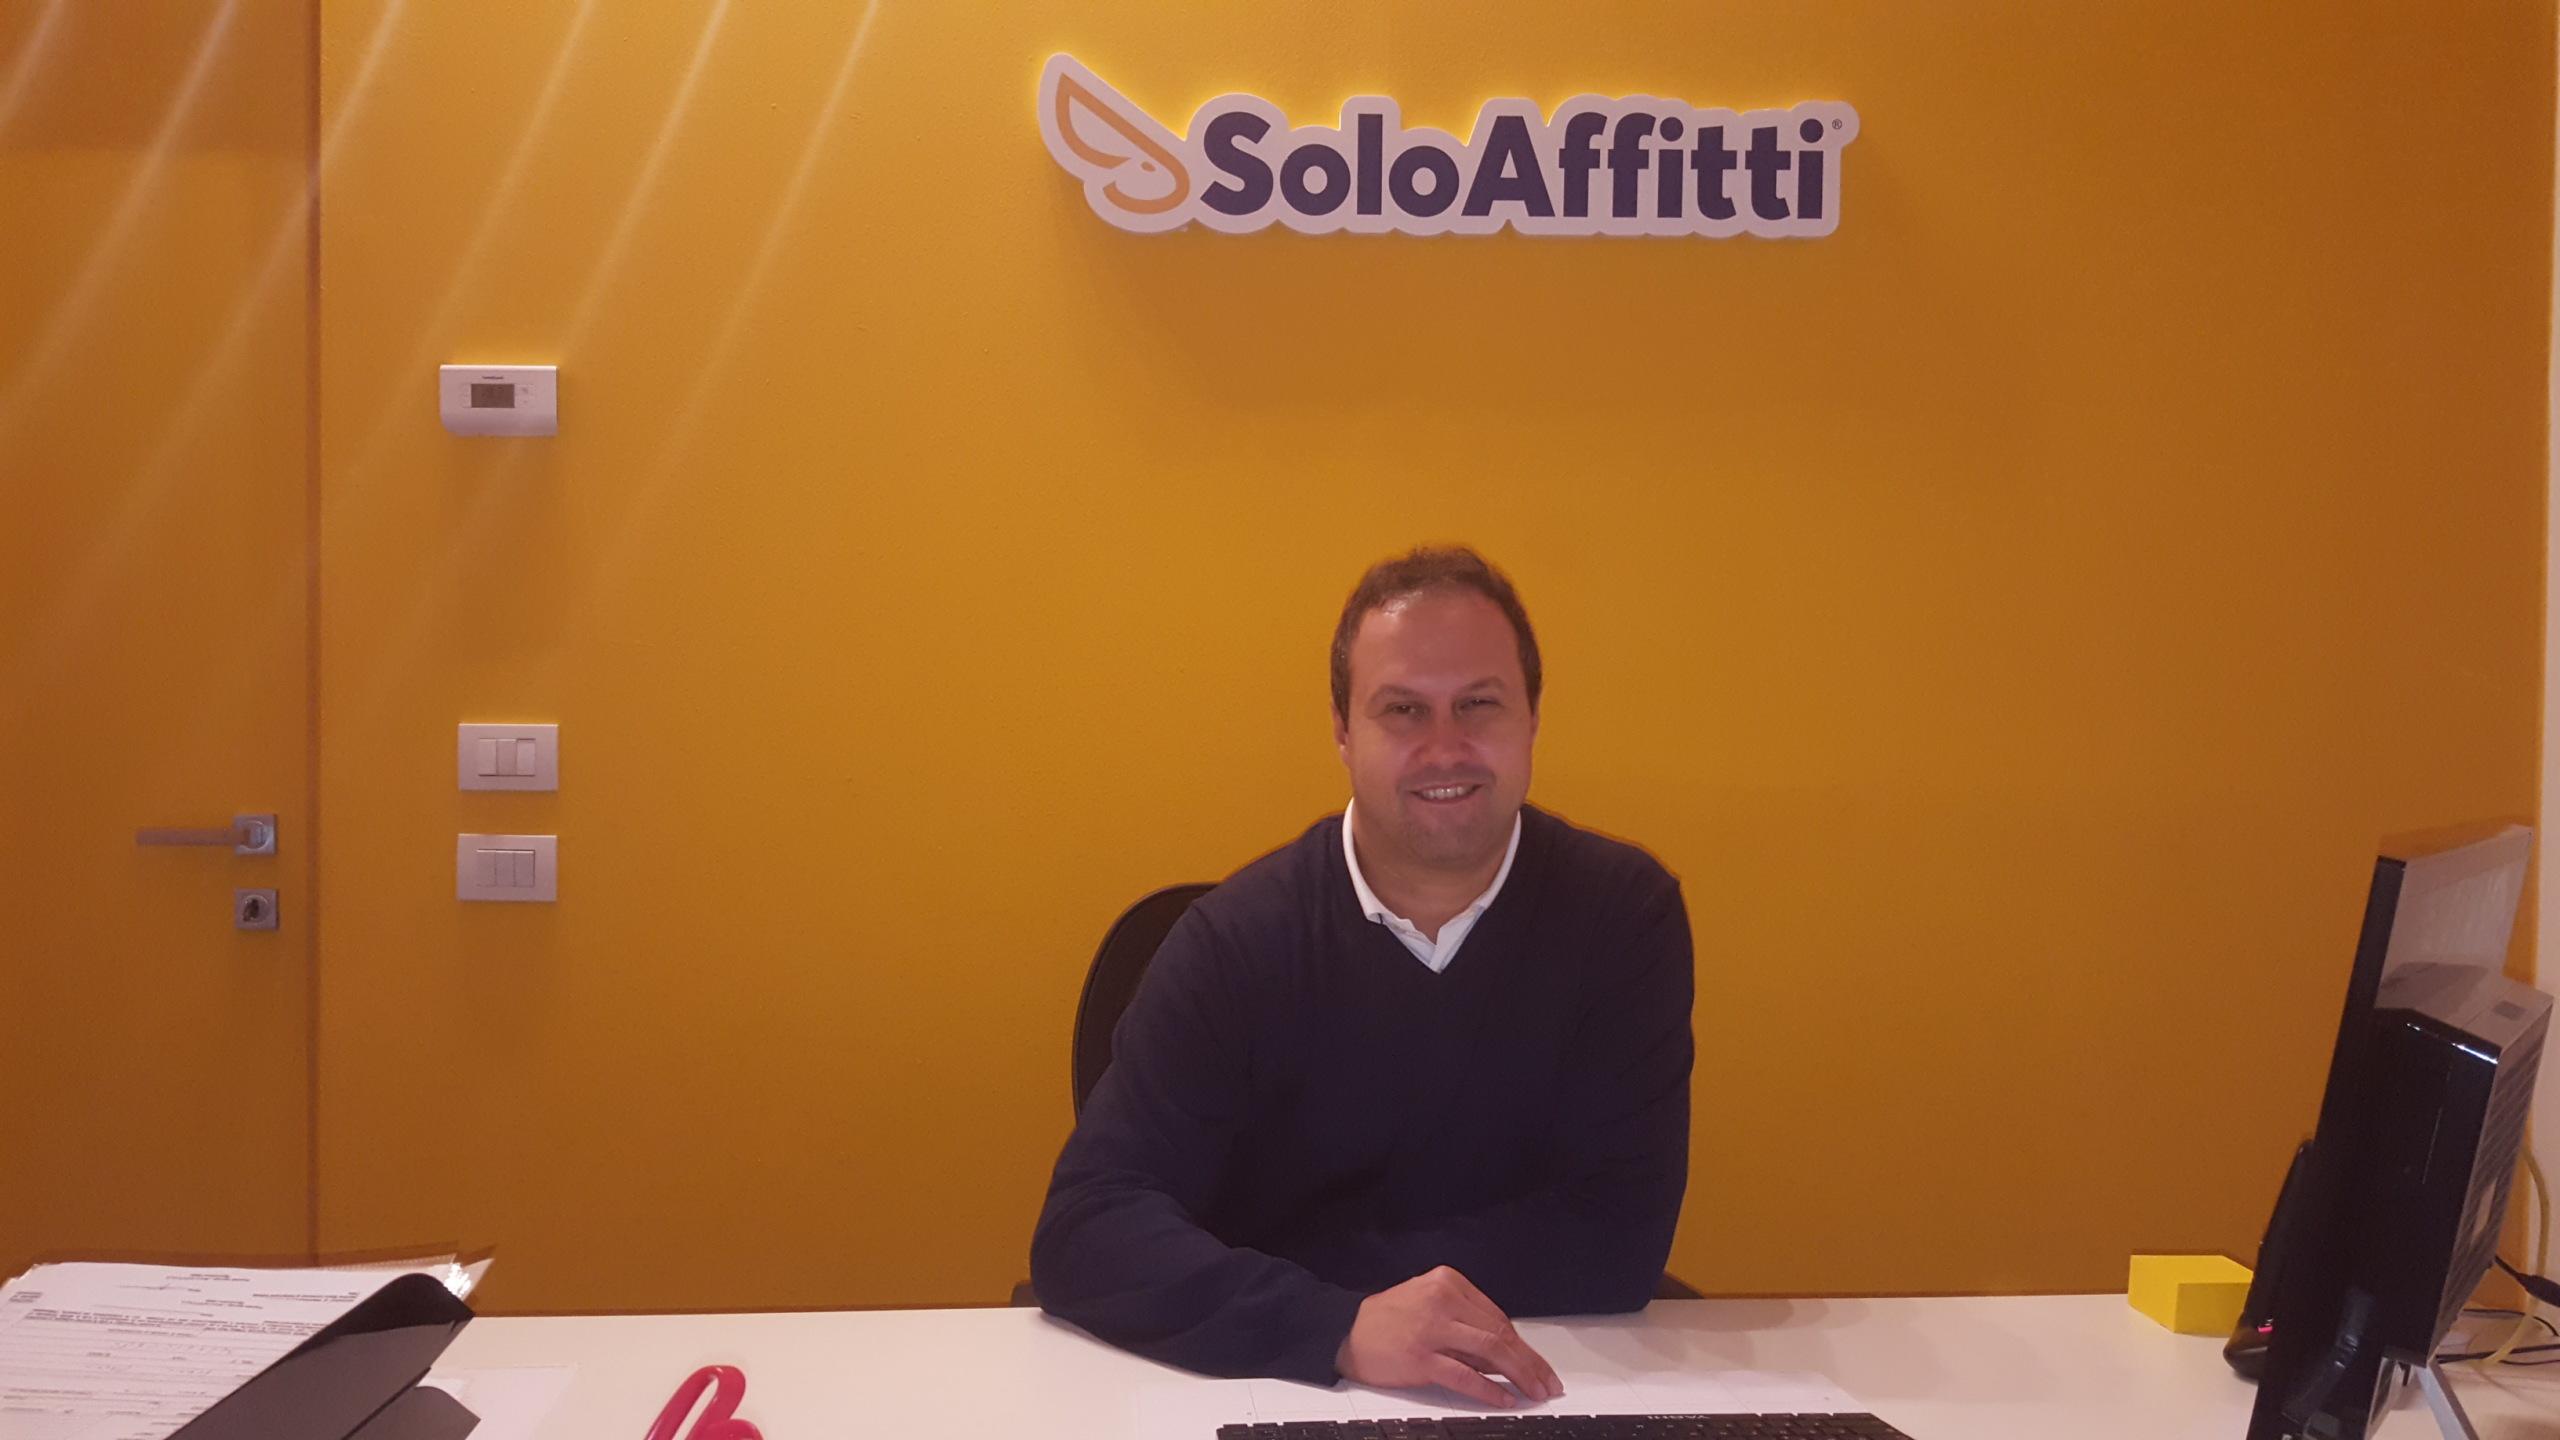 Agenzia-Bergamo2-SoloAffitti.jpg